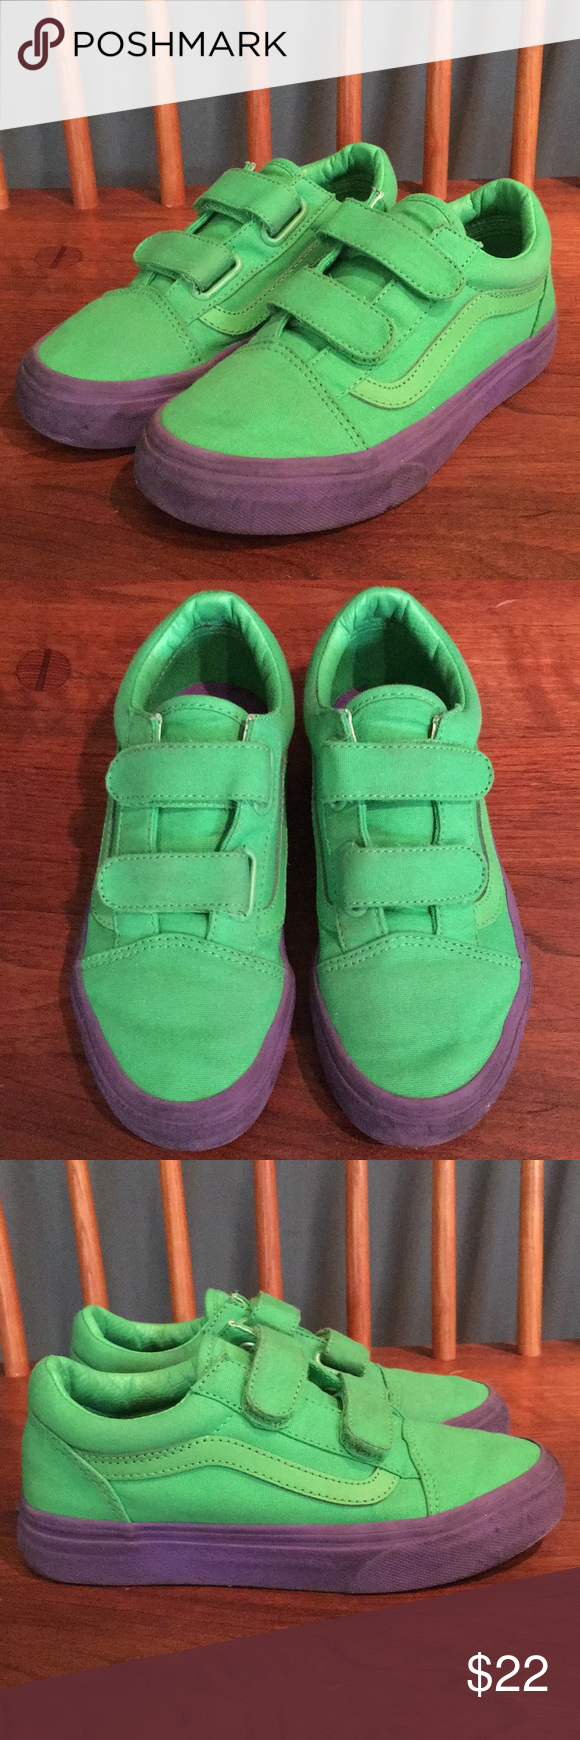 VANS TODDLER OLD SKOOL VELCRO old school sneakers baby vans station wagons VN0A344KQ7M green [216 Shinnyu load]